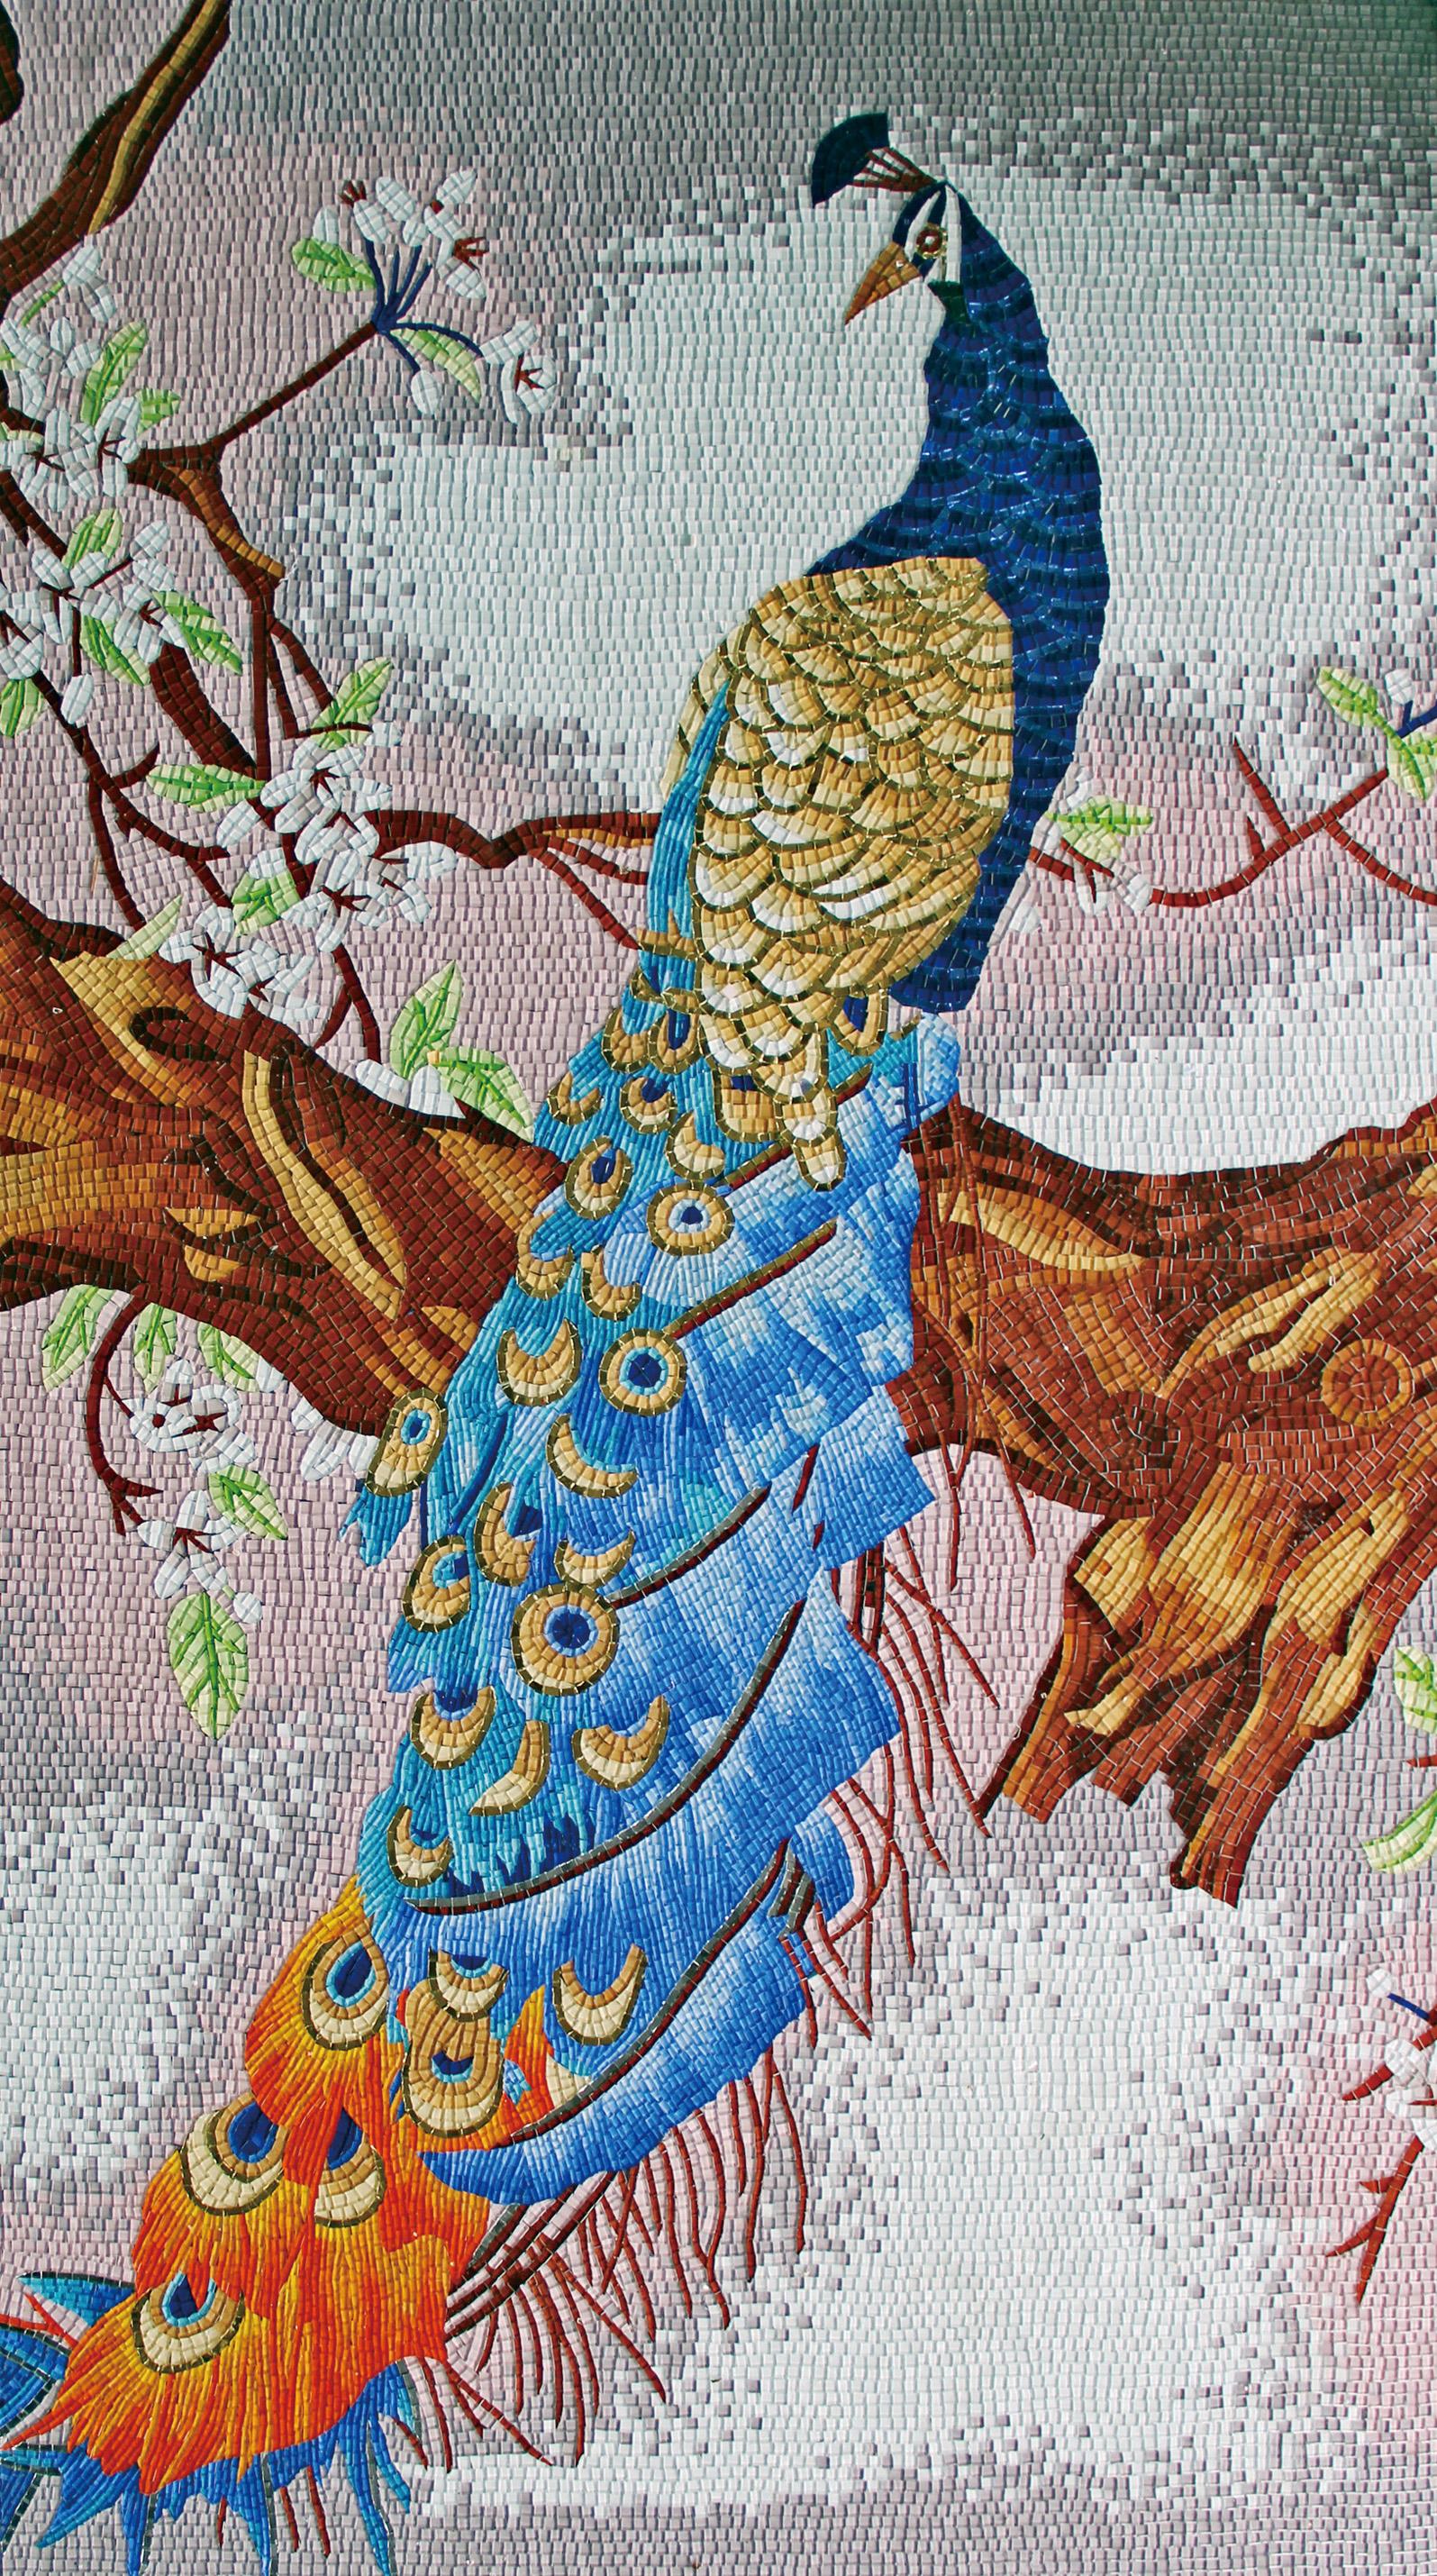 Ice Onyx Symphony Mirror Glass Mosaic Peacock Animal